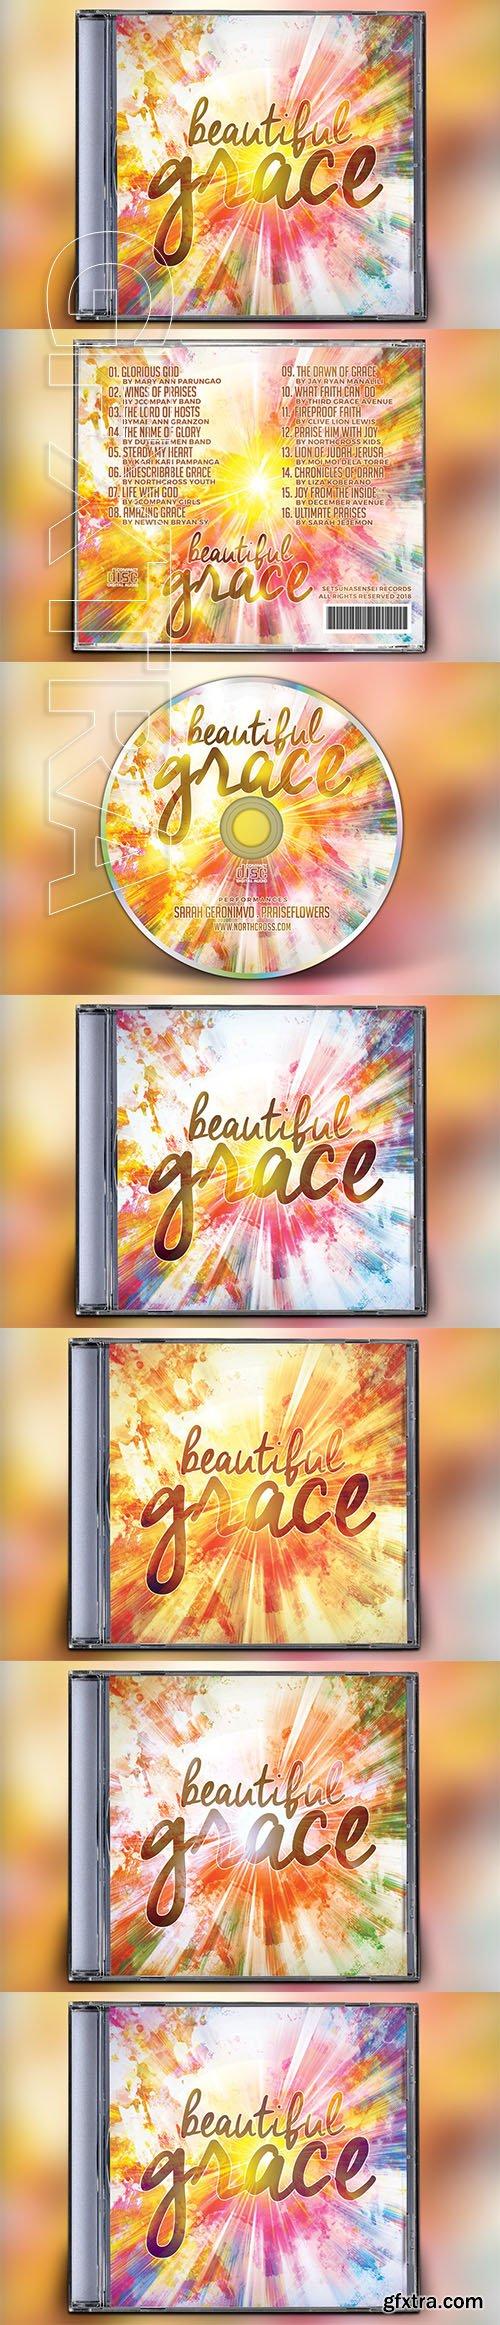 CreativeMarket - Beautiful Grace CD Album Artwork 3165757